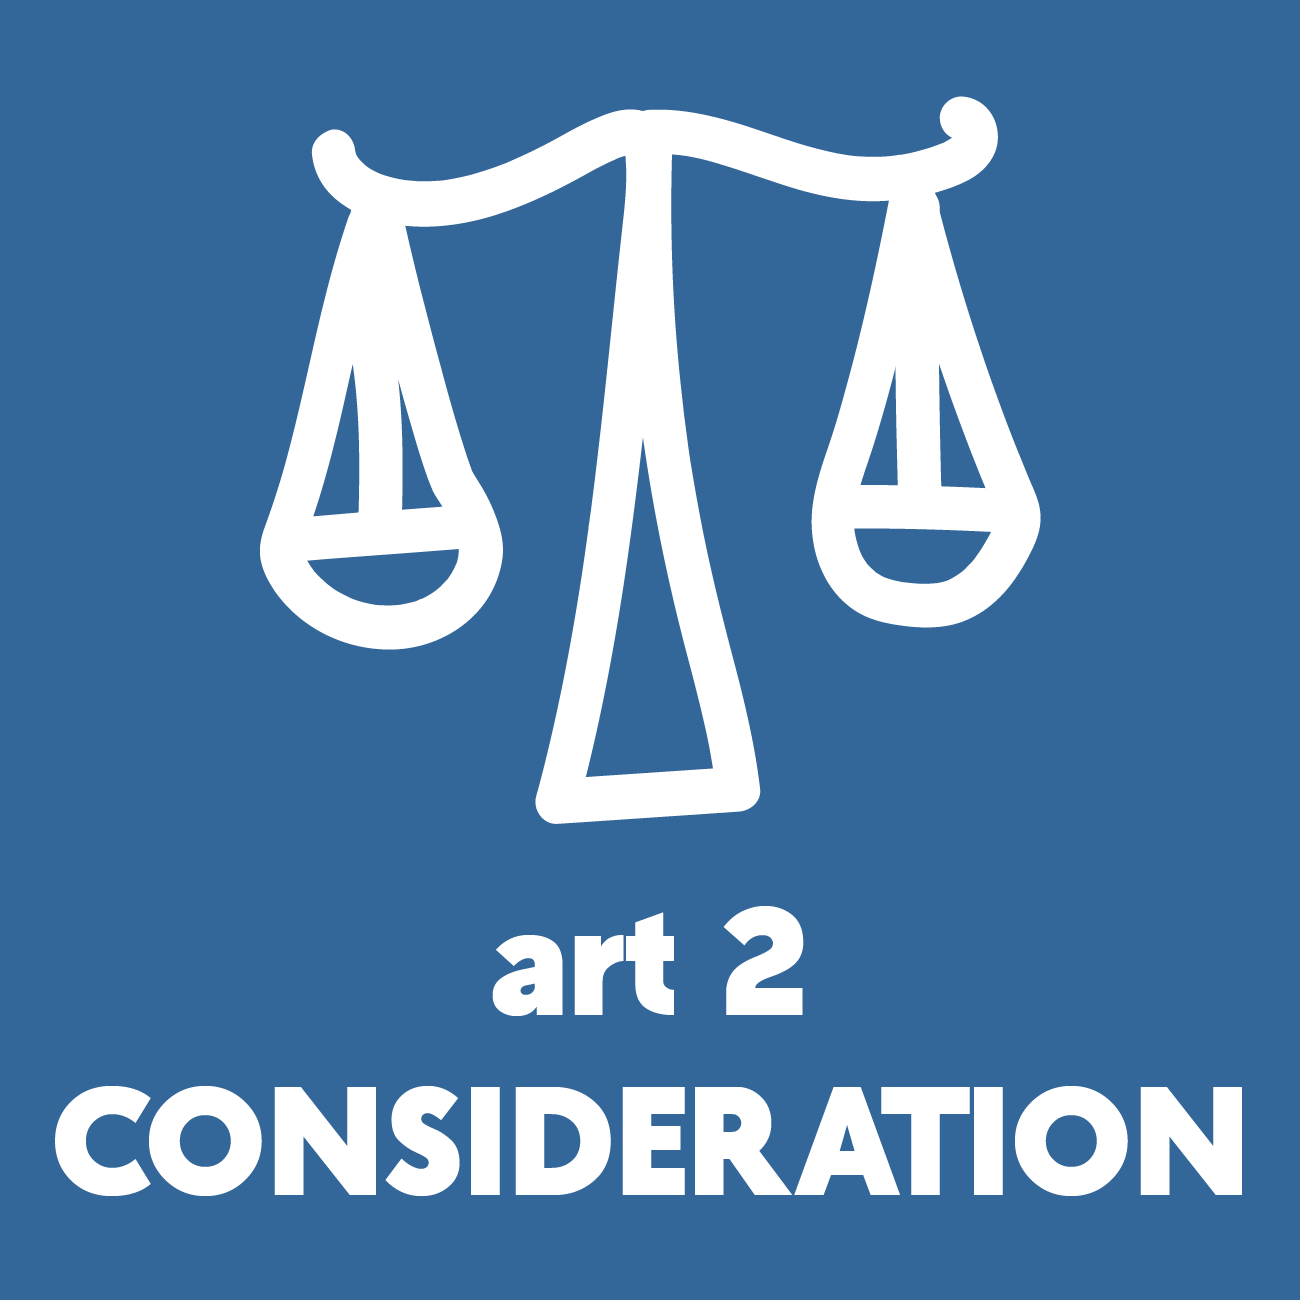 Art 02 consideration